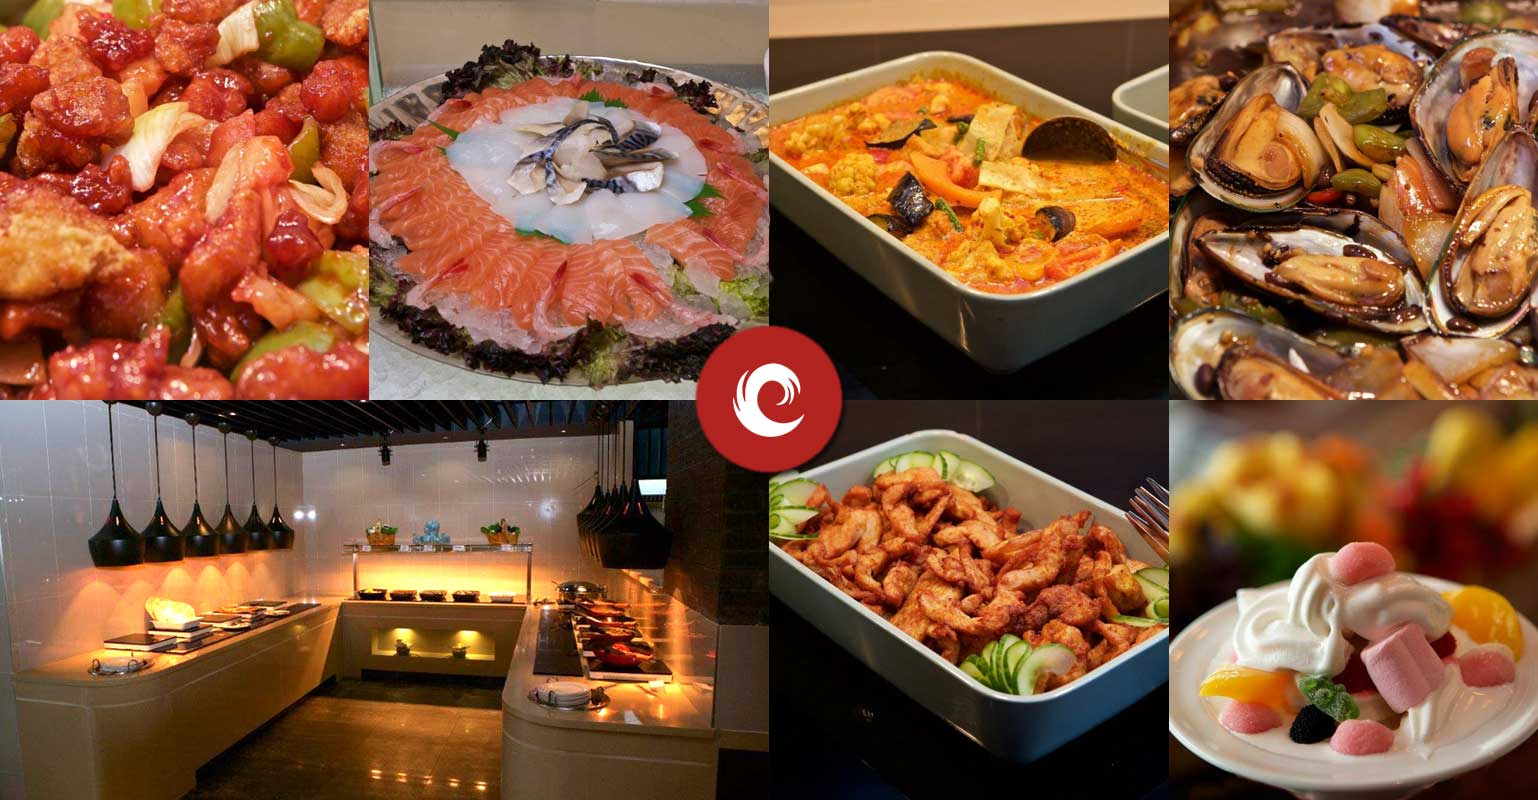 Aroma Buffet Halal Restaurant Shepherd S Bush London Feed The Lion